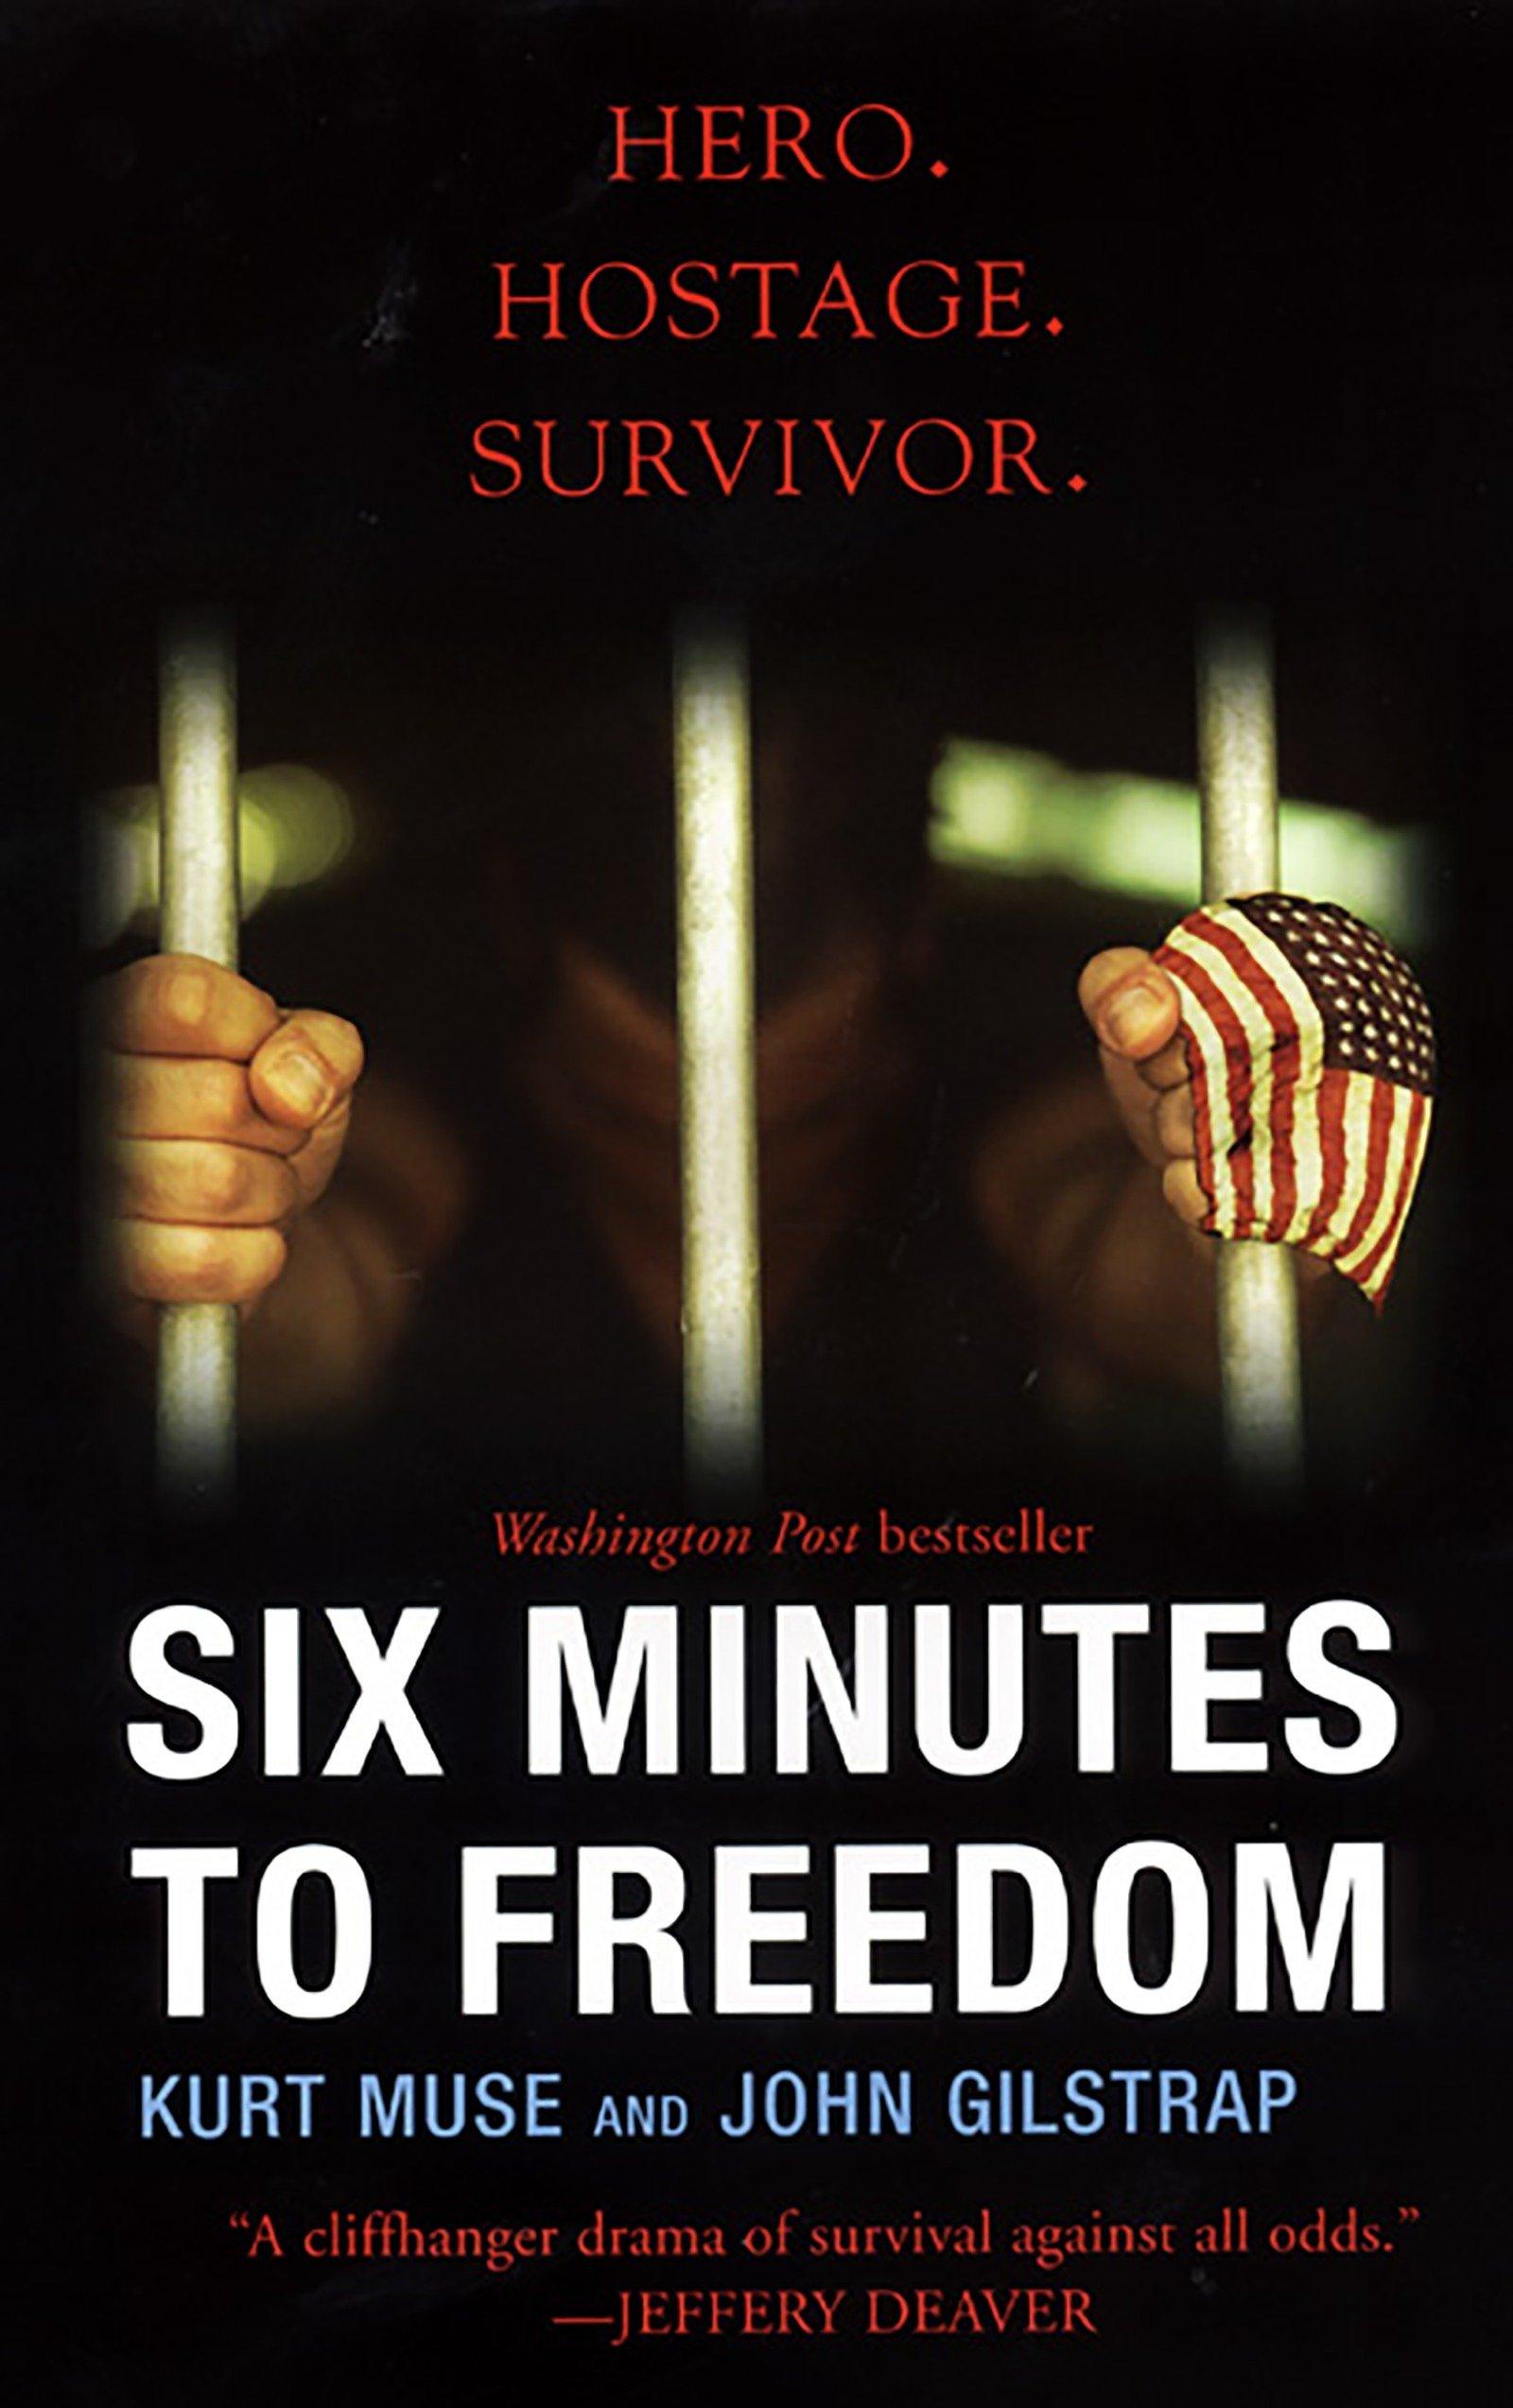 Amazon.com: Six Minutes to Freedom (9780806528045): Kurt Muse, John  Gilstrap: Books